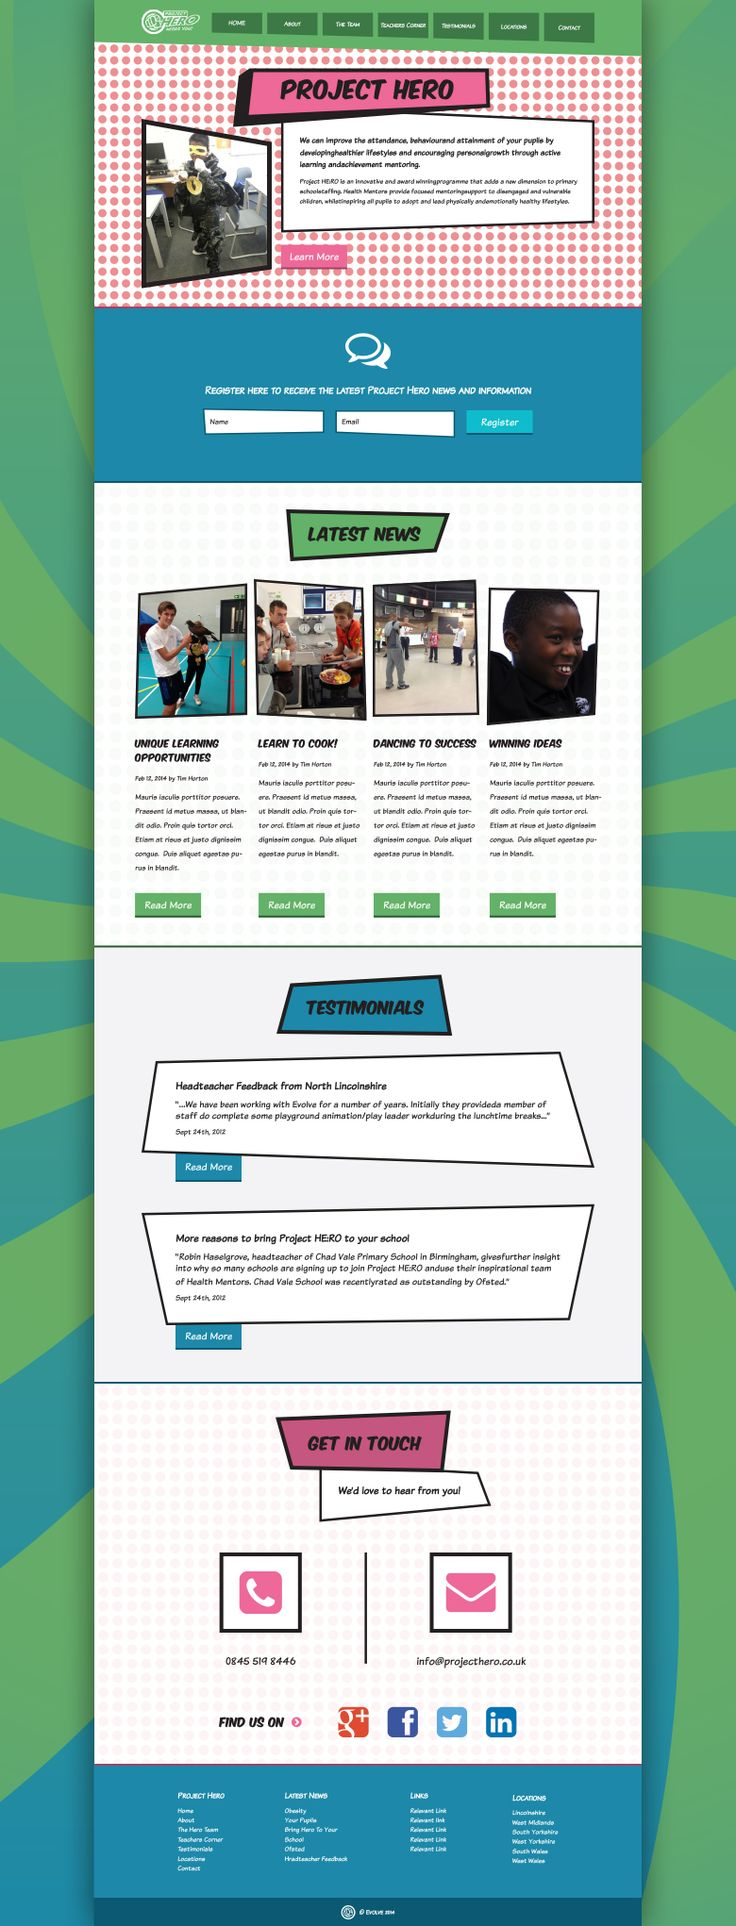 Project Hero #Charity #WebDesign by #YellowDNA